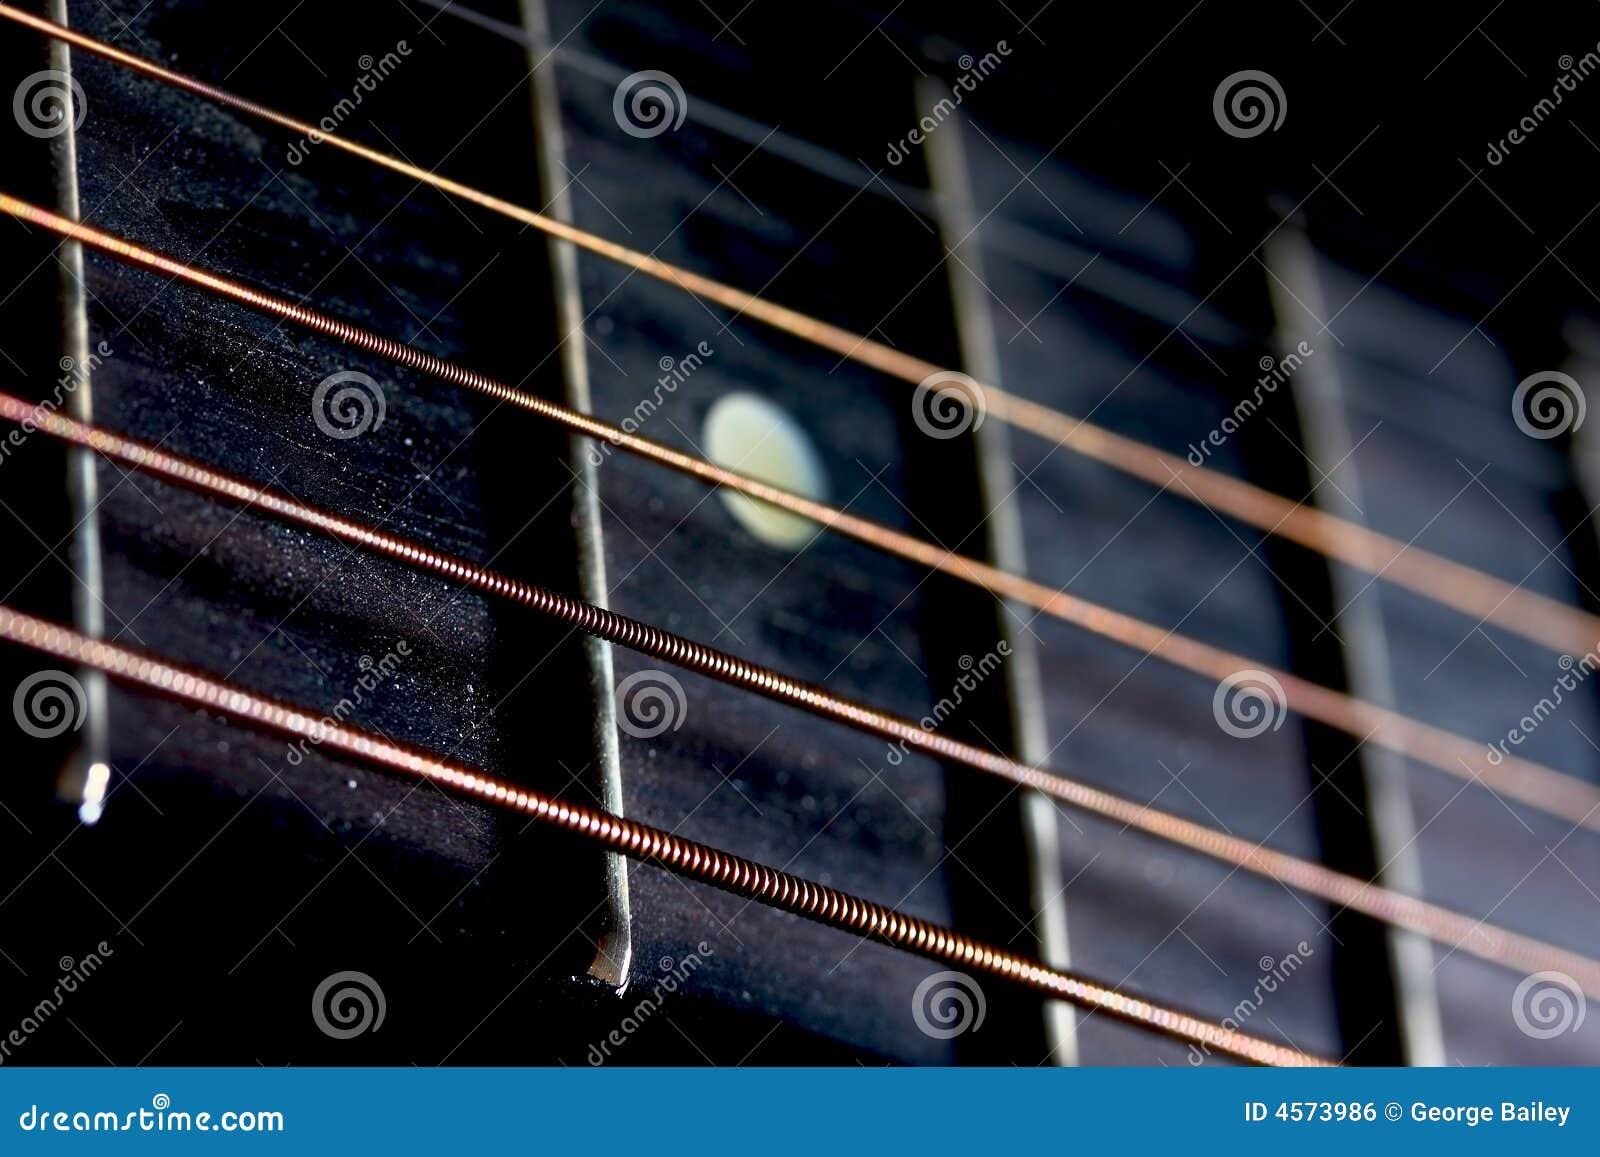 guitar strings and frets stock photo image of black blur 4573986. Black Bedroom Furniture Sets. Home Design Ideas